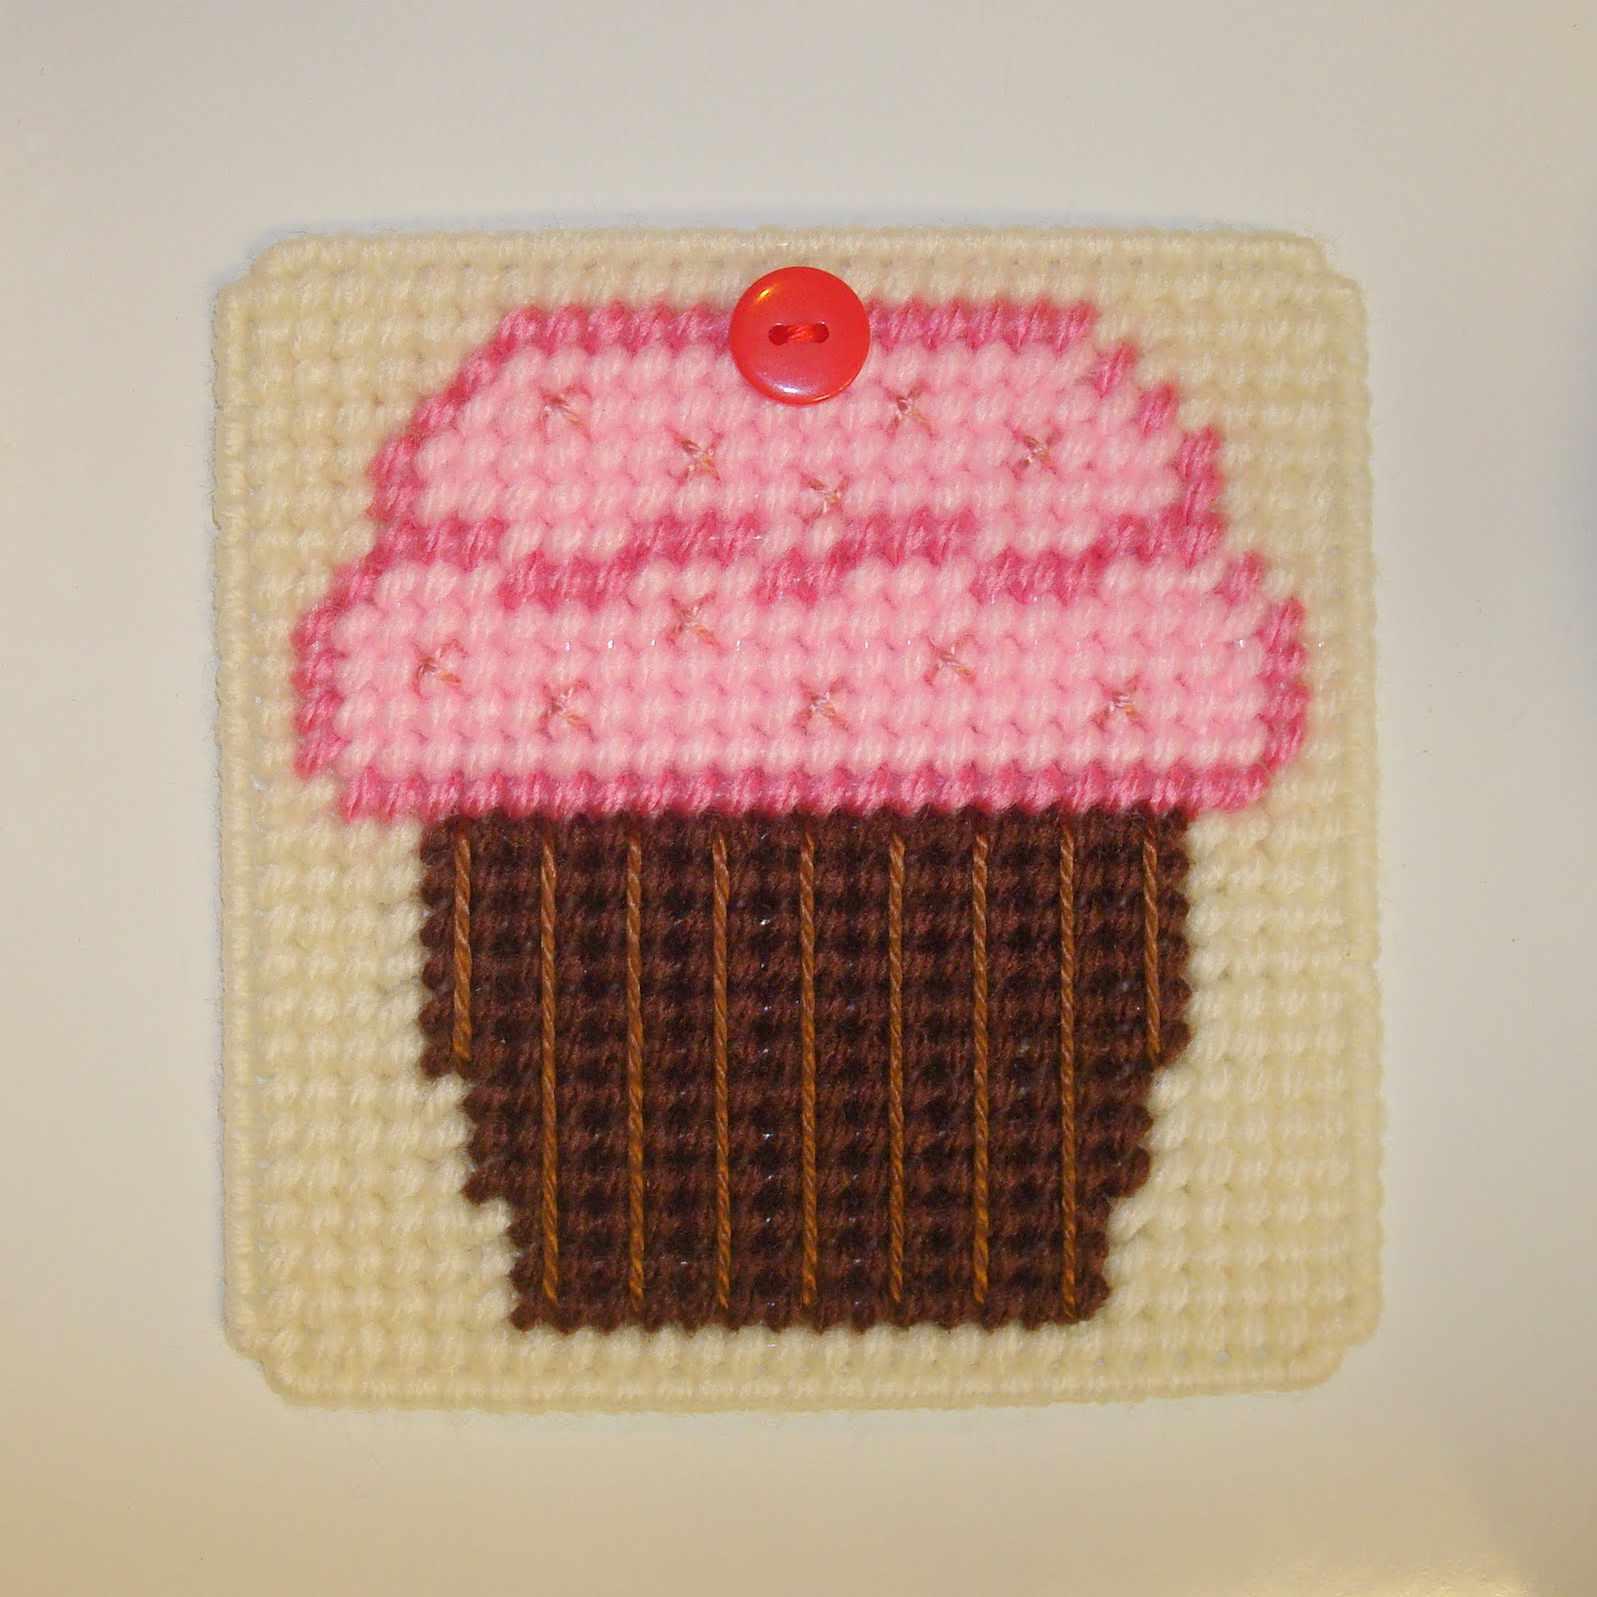 Cupcake coaster